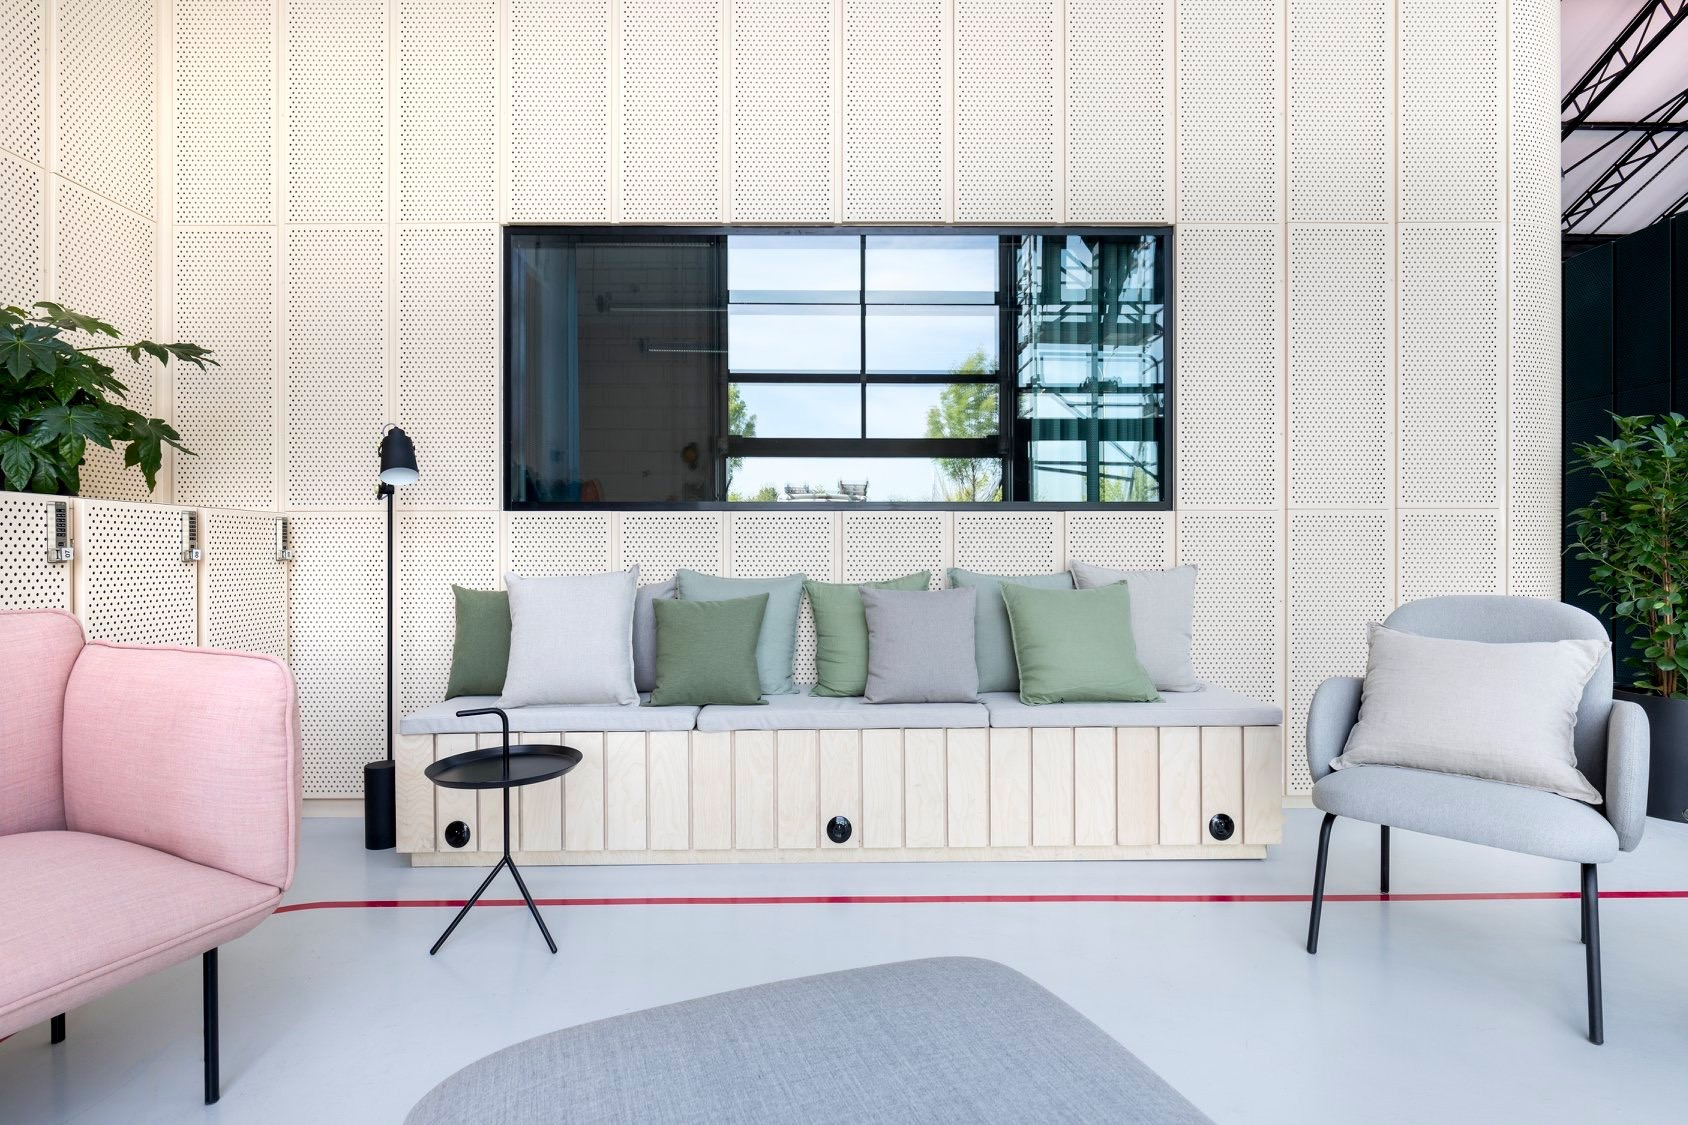 AménagementL'espace MYT L'Oréal Studio Trigone